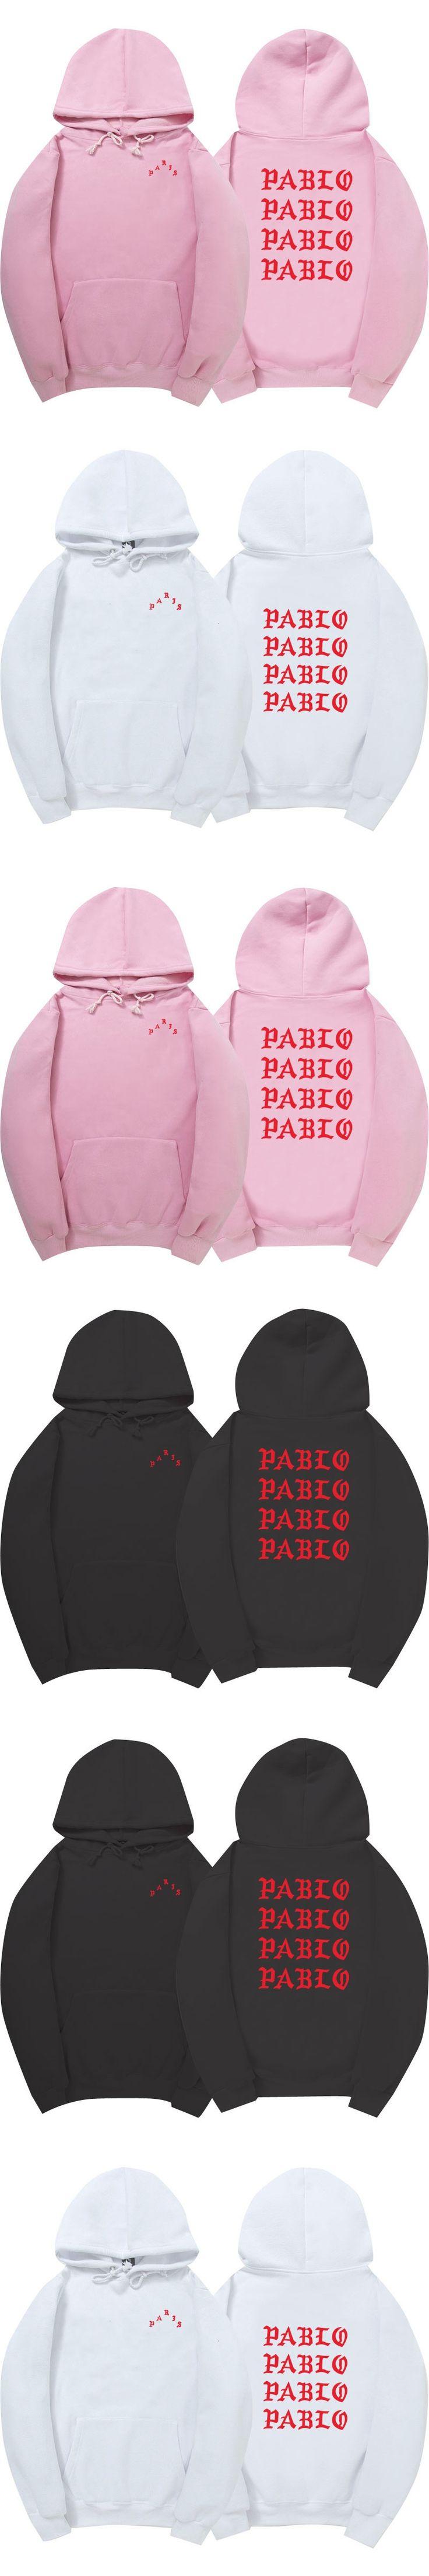 I Feel Like Paul Pablo Kany West sweatshirt men fashion Sweatshirt Hoodies Hip Hop Streetwear Hoody pablo hoodie